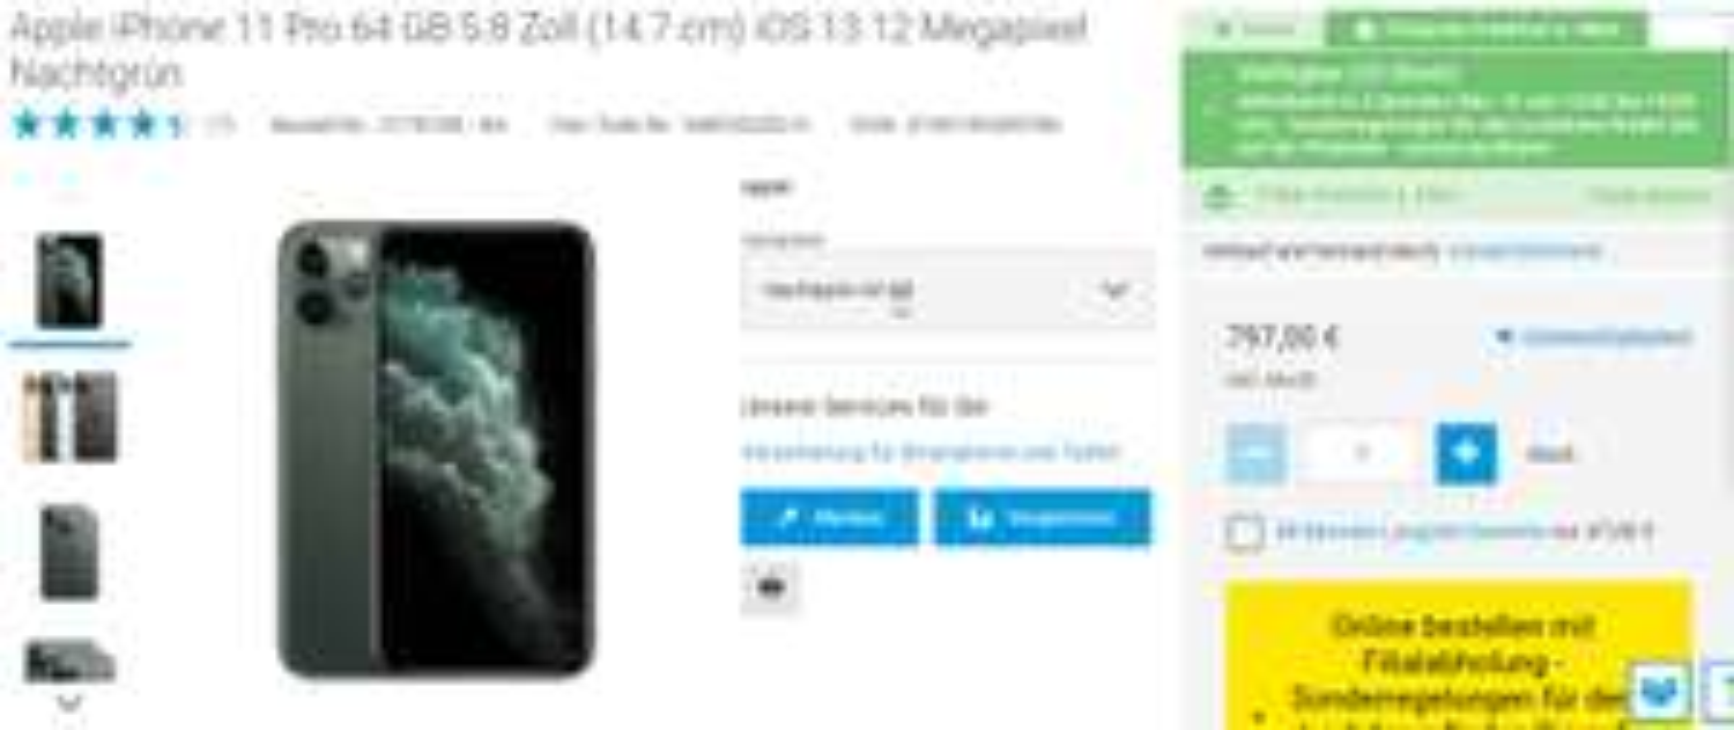 (Conrad Markt Frankfurt und via Völkner) Apple iPhone 11 Pro 64 GB Nachtgrün Versand oder Click & Collect